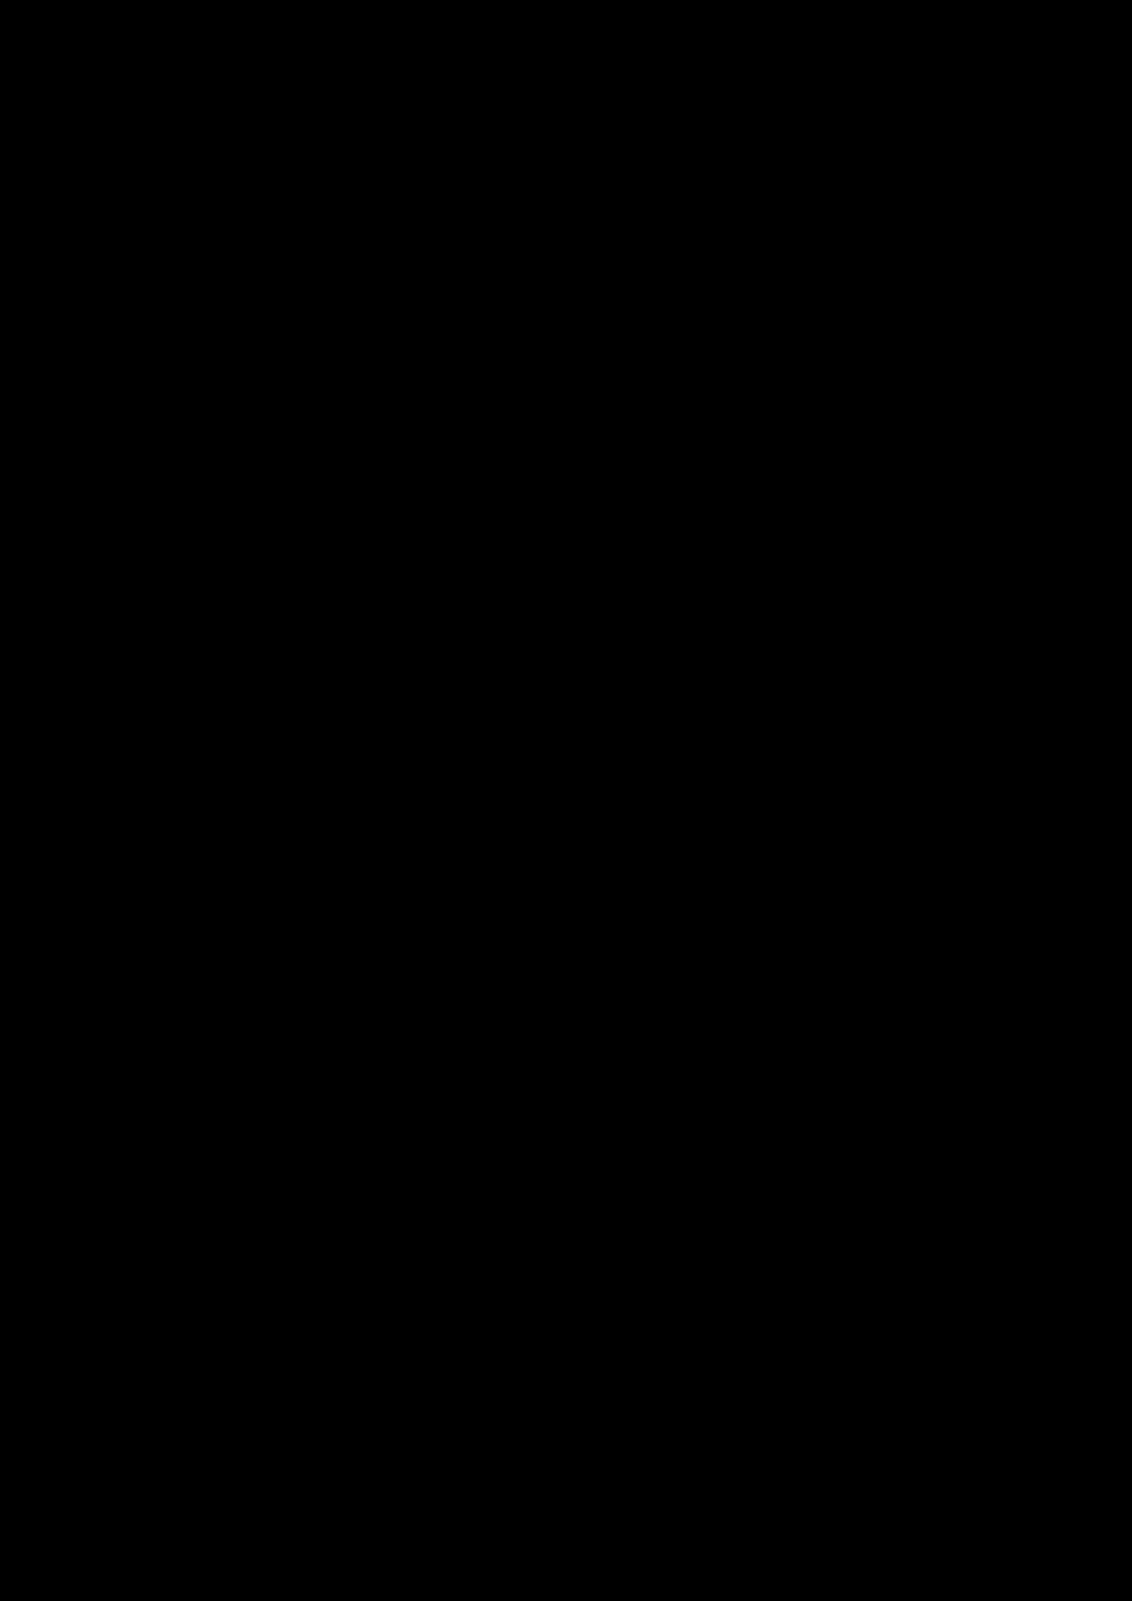 Obryiv slide, Image 2